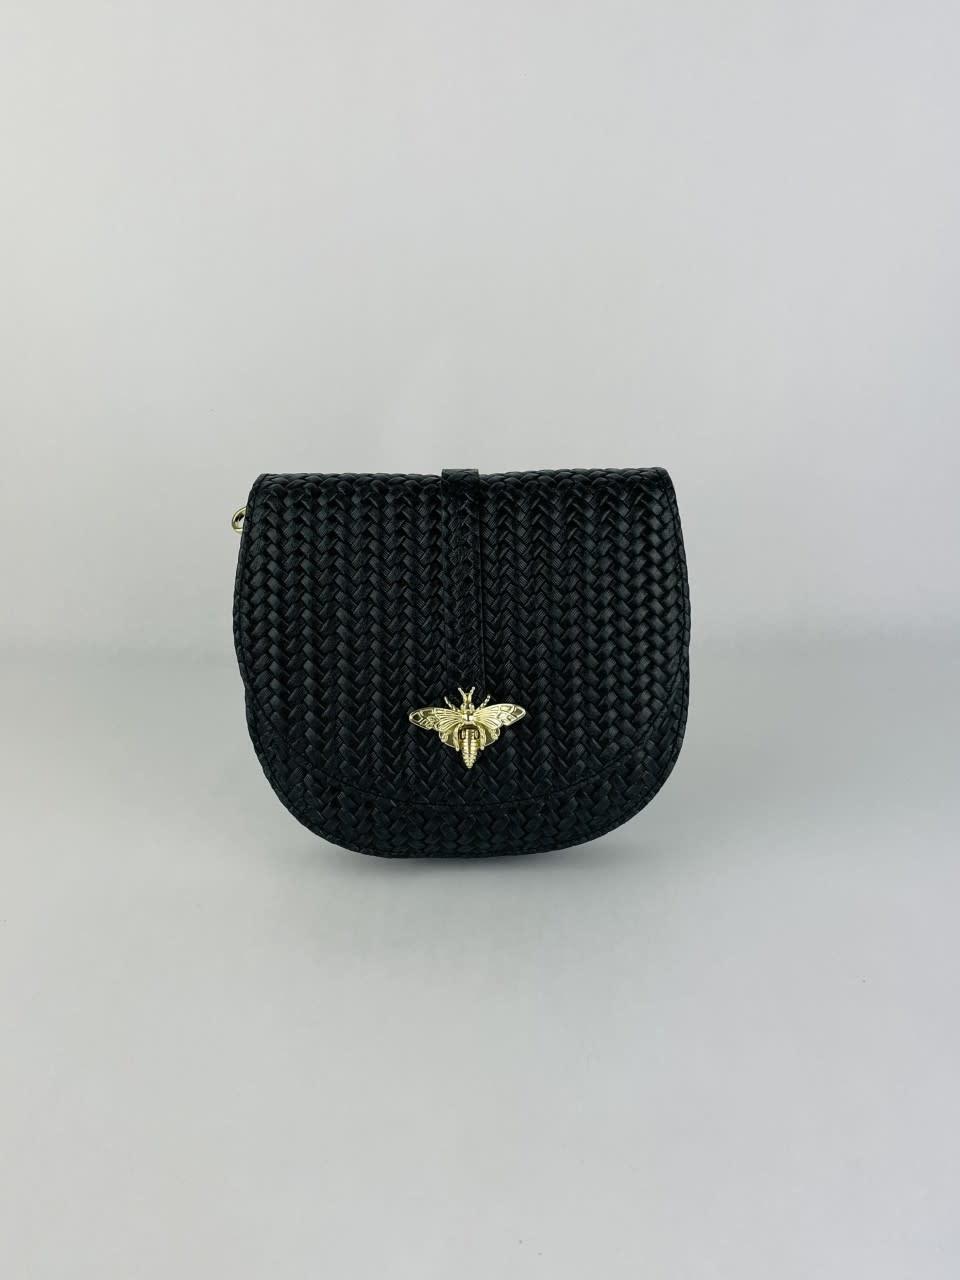 Cléo calf leather dragonfly bag Black-1